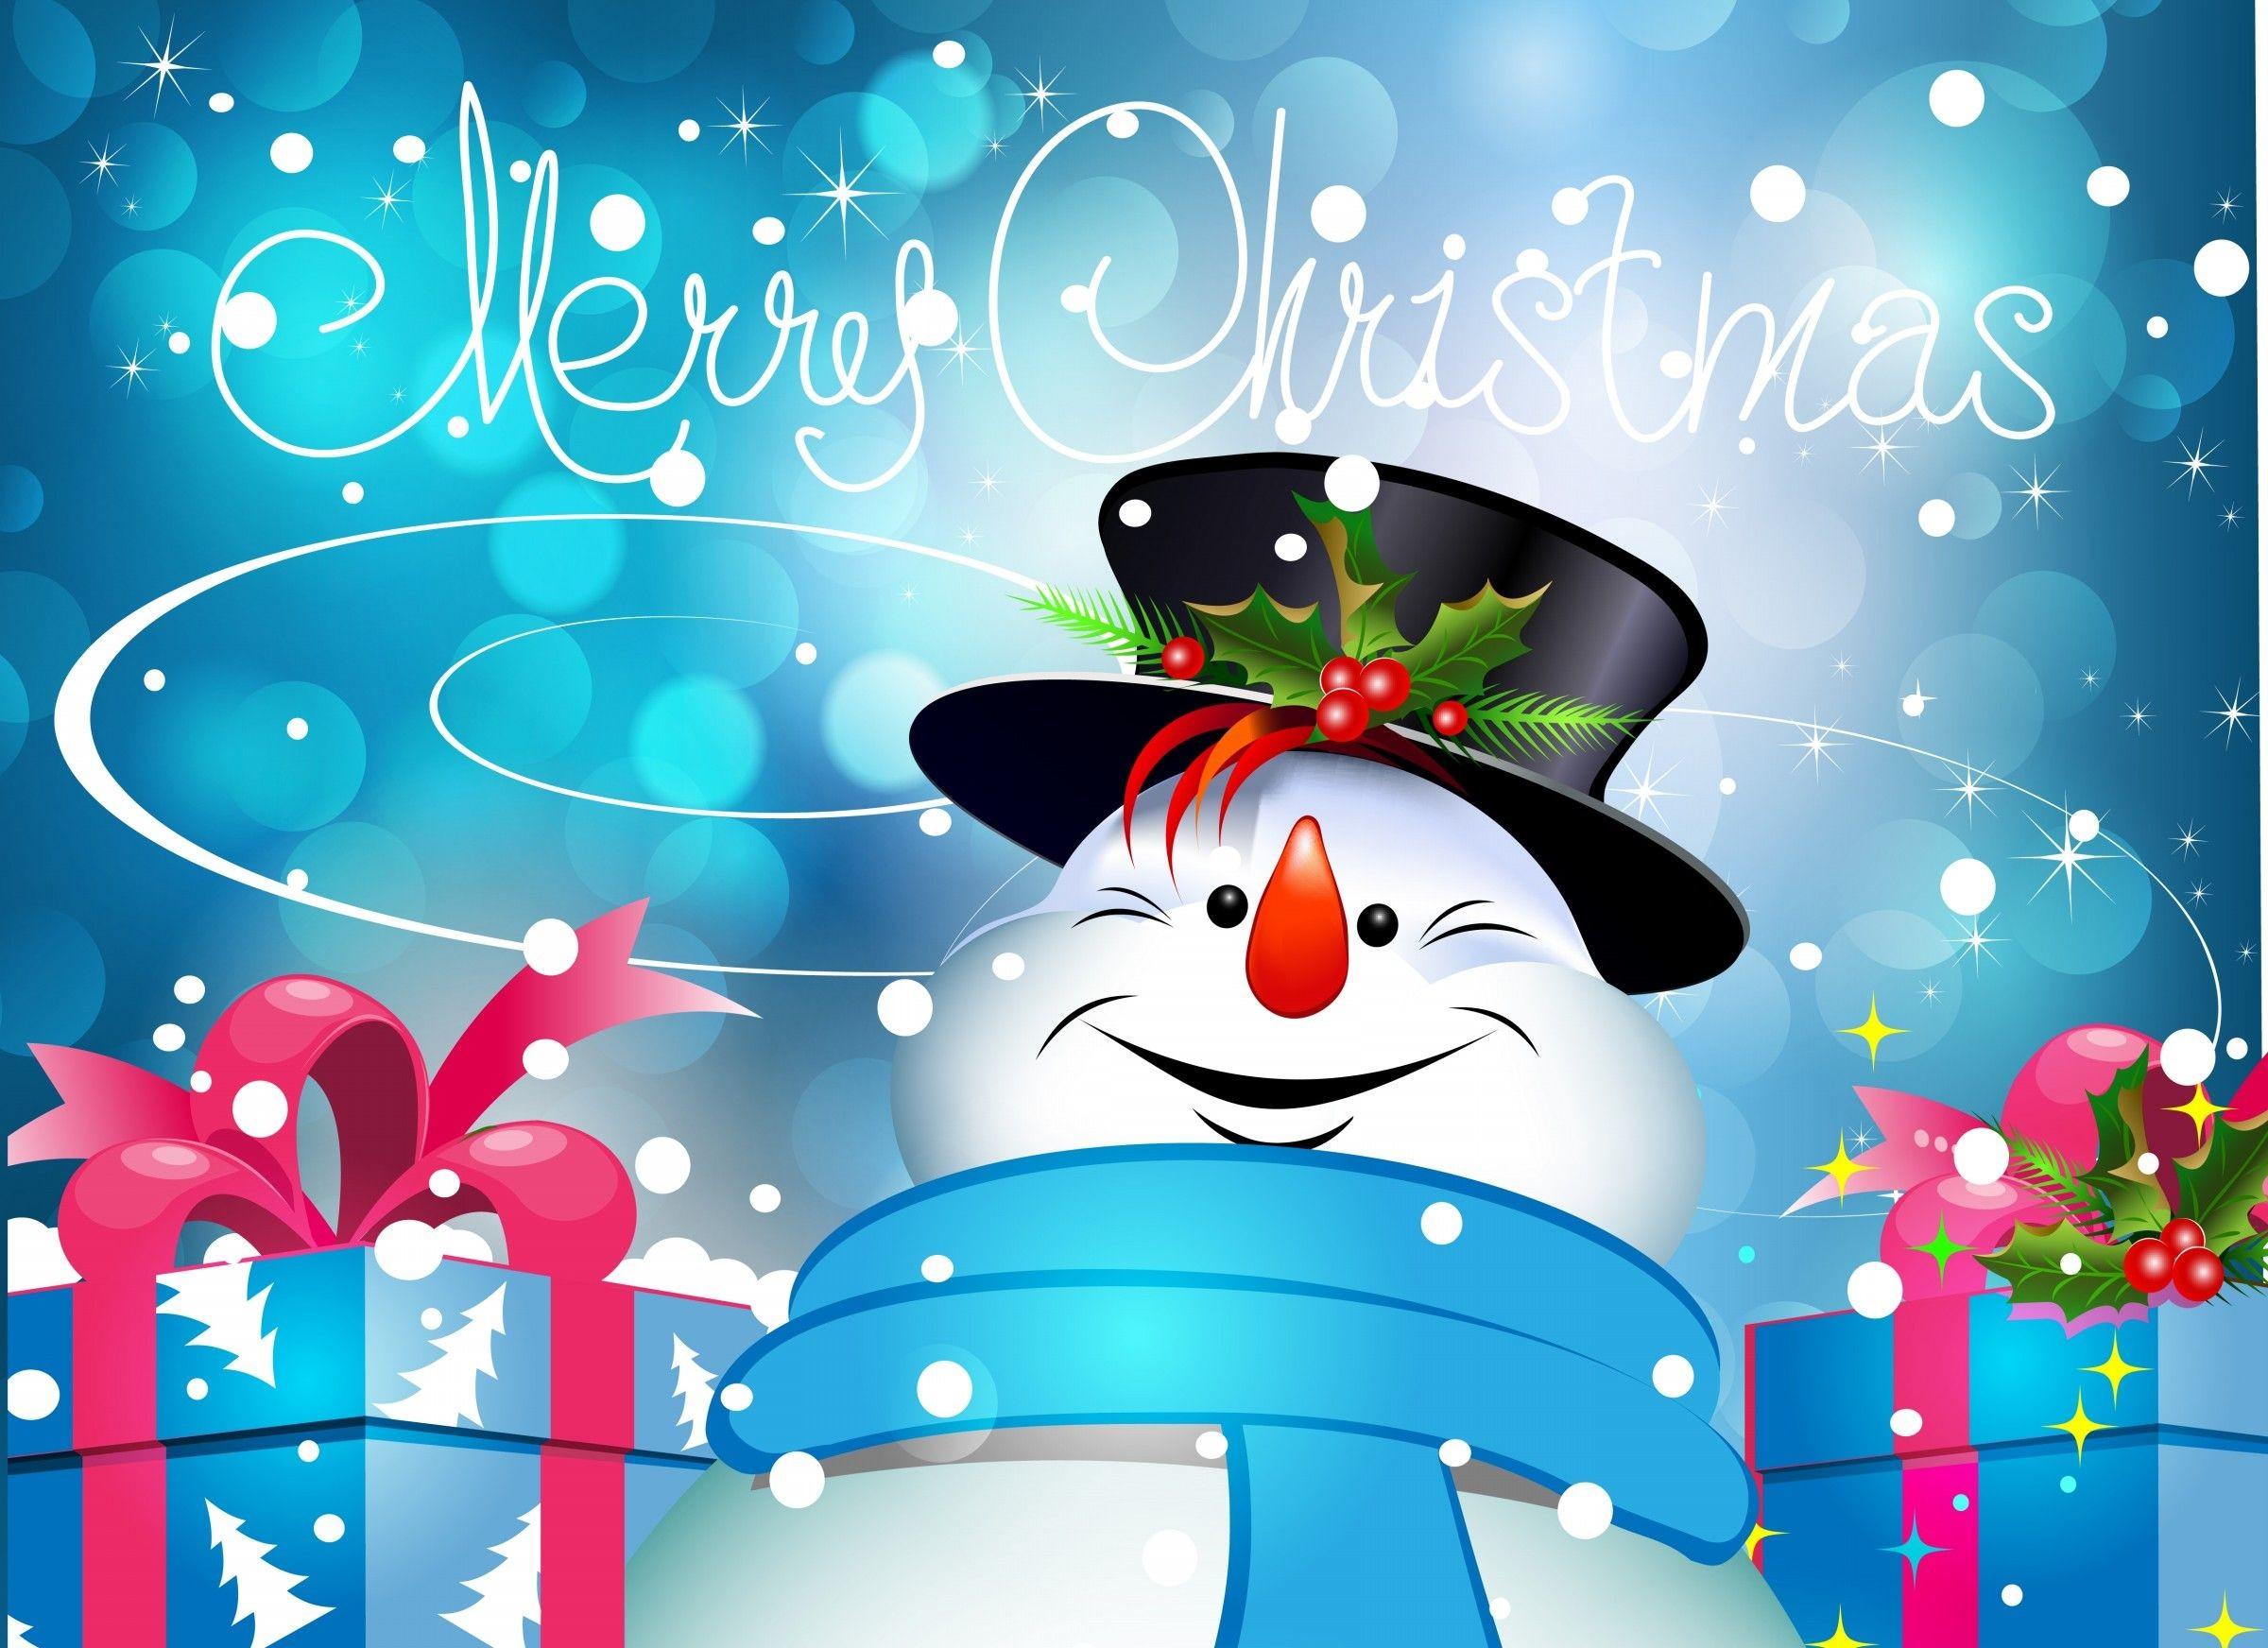 … Christmas Desktop Wallpaper Hd Free. Download